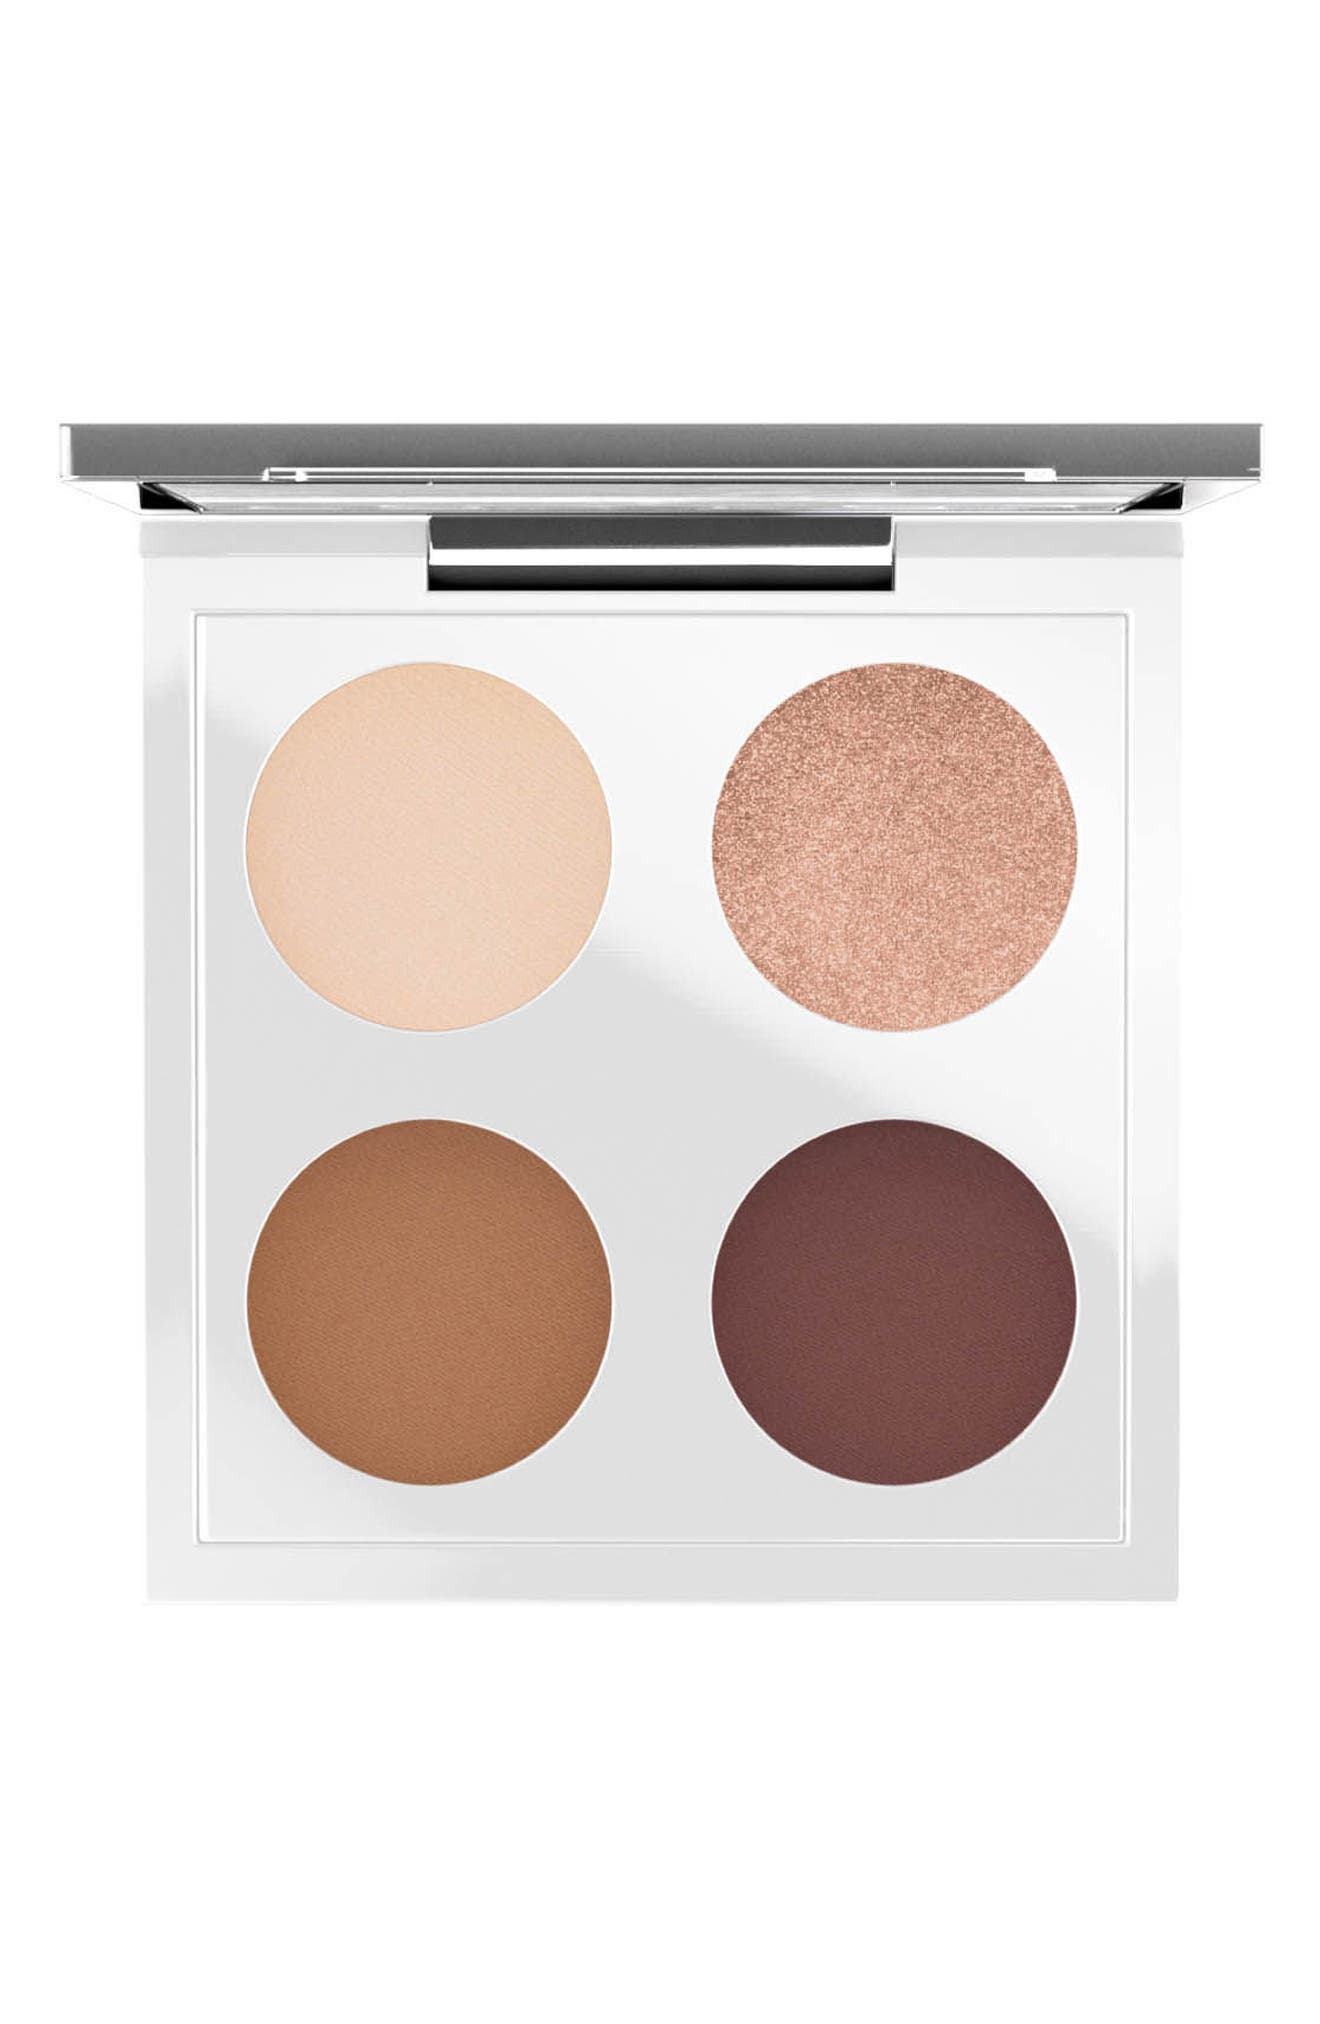 MAC x Patrickstarrr Eyeshadow Palette